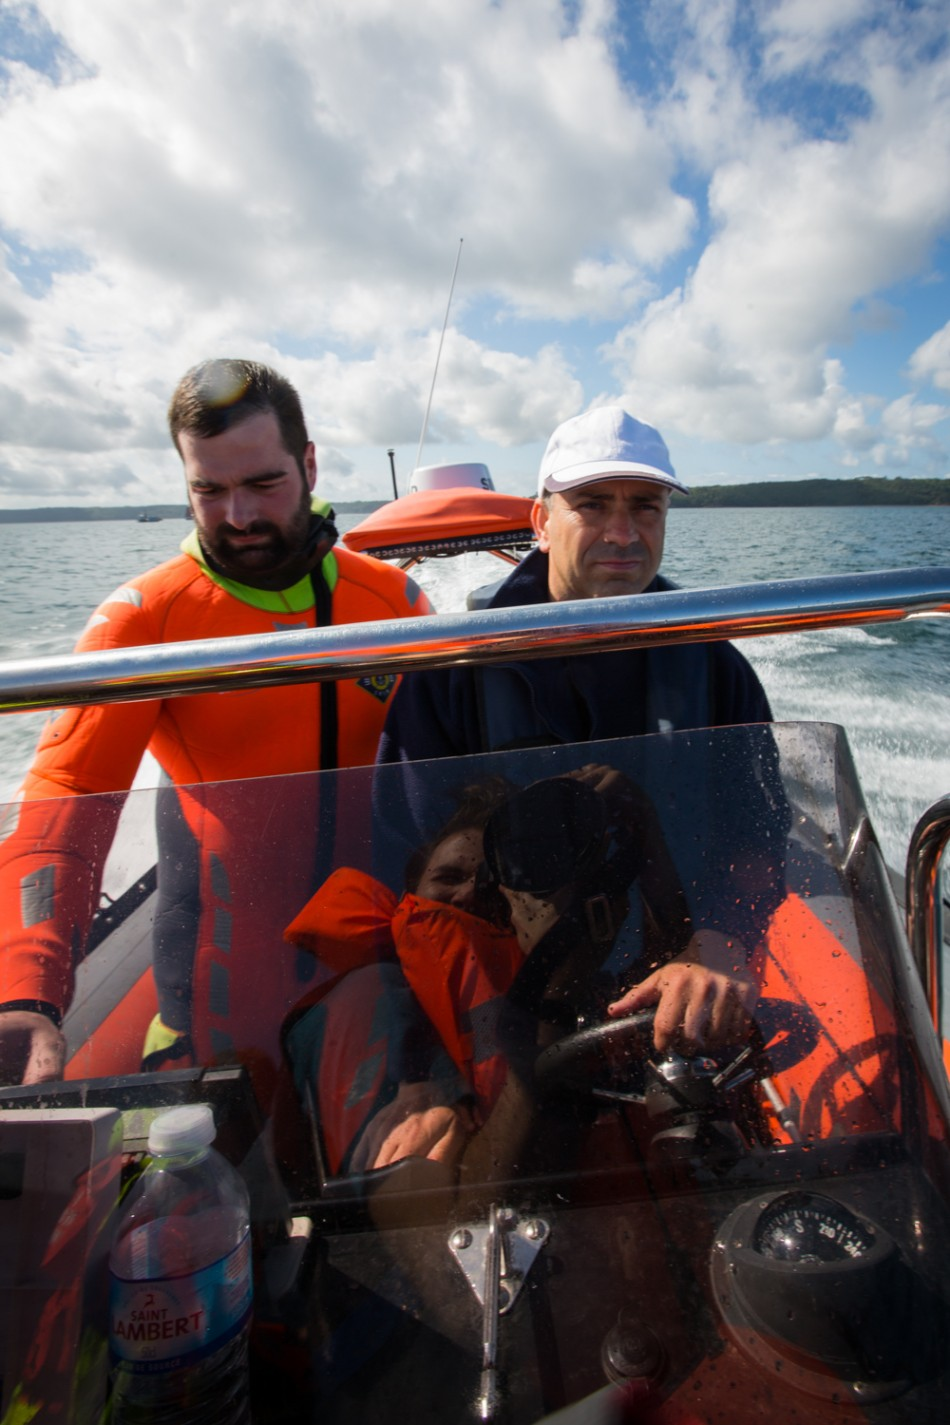 On board a boat of the Société nationale de sauvetage en mer. Photo: Christian Lendl